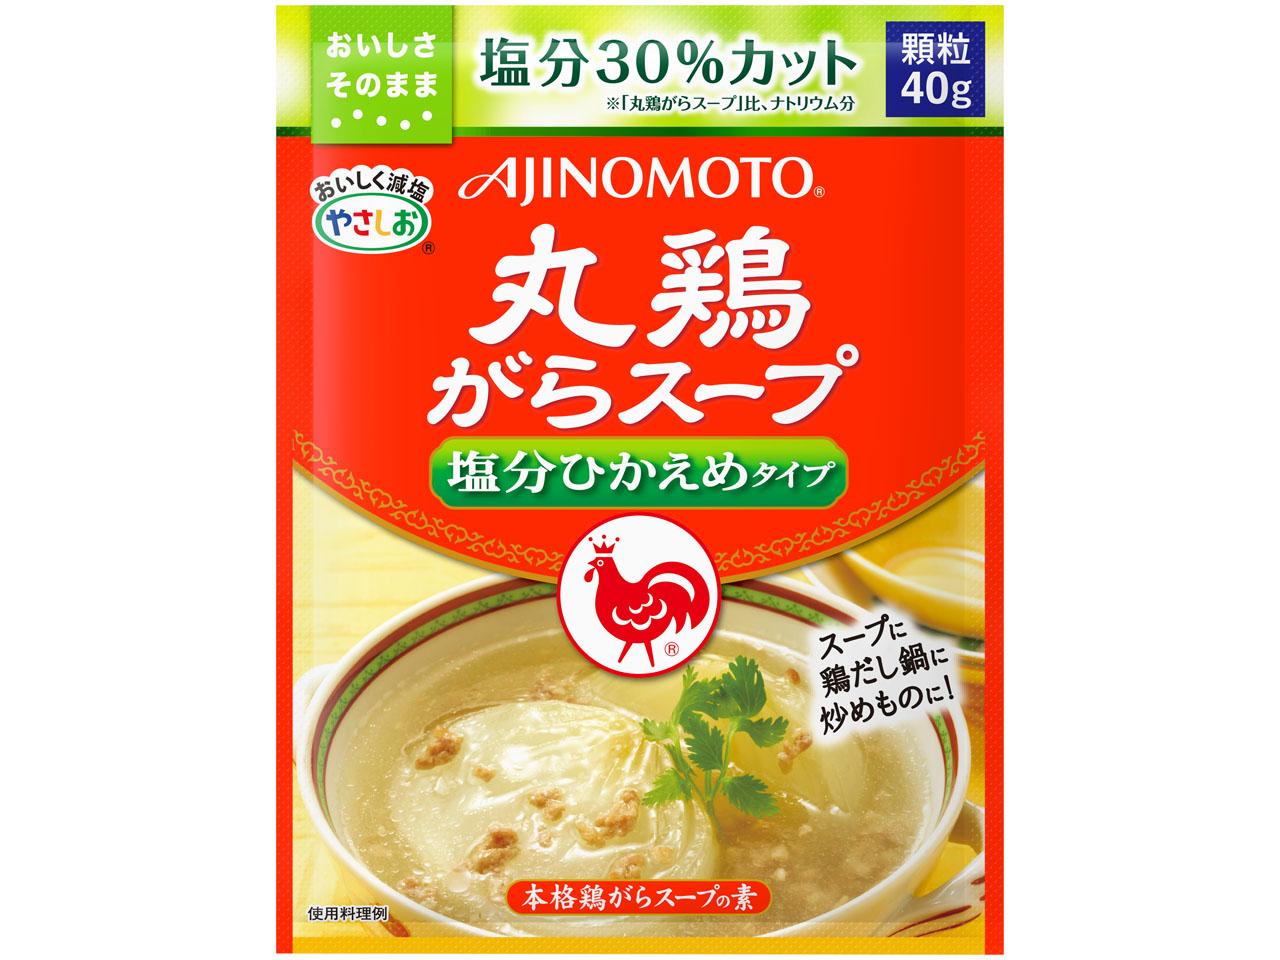 http://okyakusama.ajinomoto.co.jp/qa/marudorisoup_genen40g.jpg